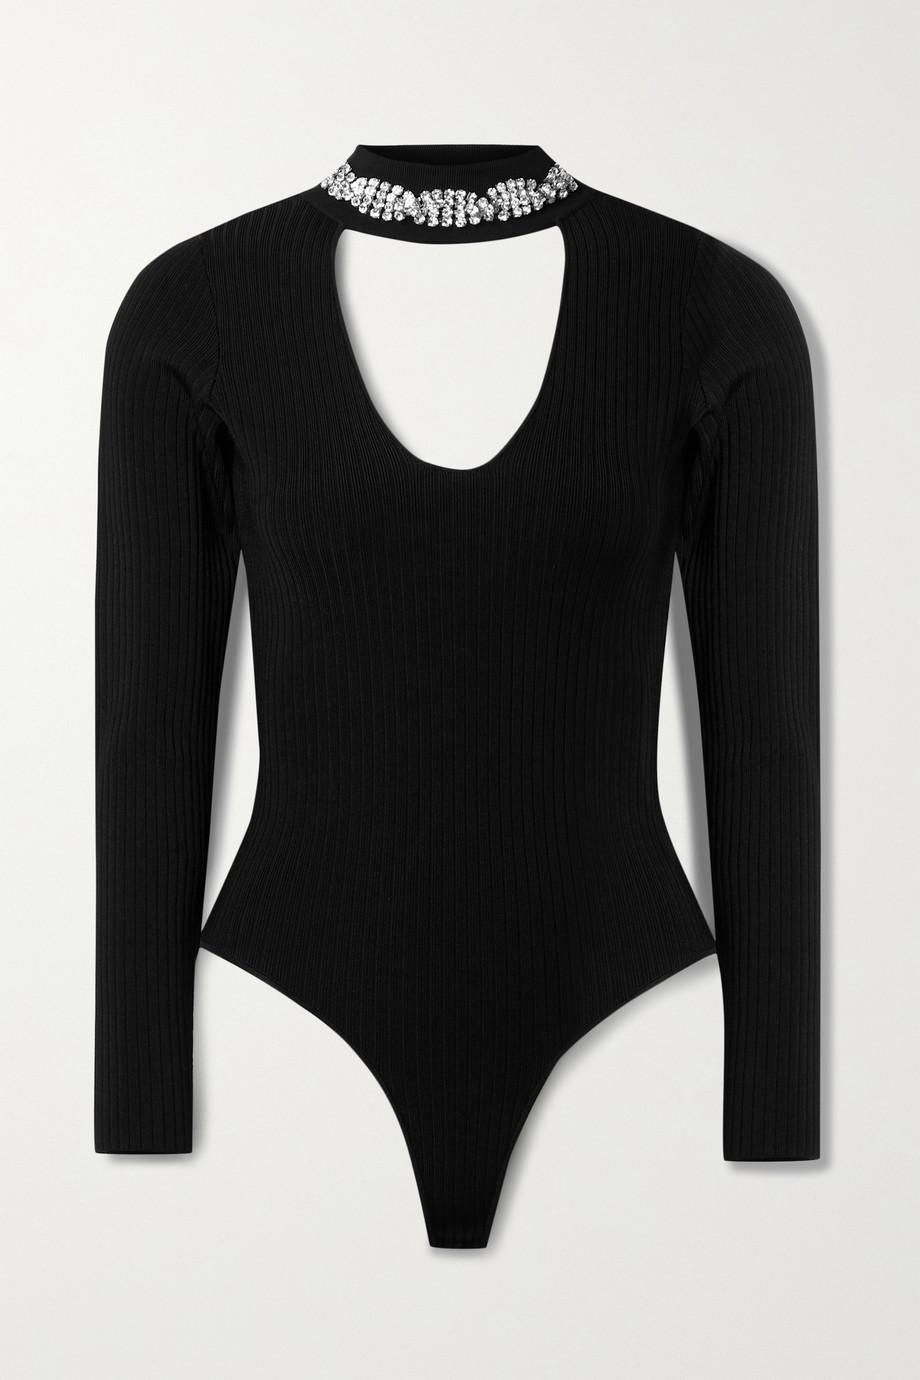 AREA Cutout crystal-embellished ribbed-knit bodysuit